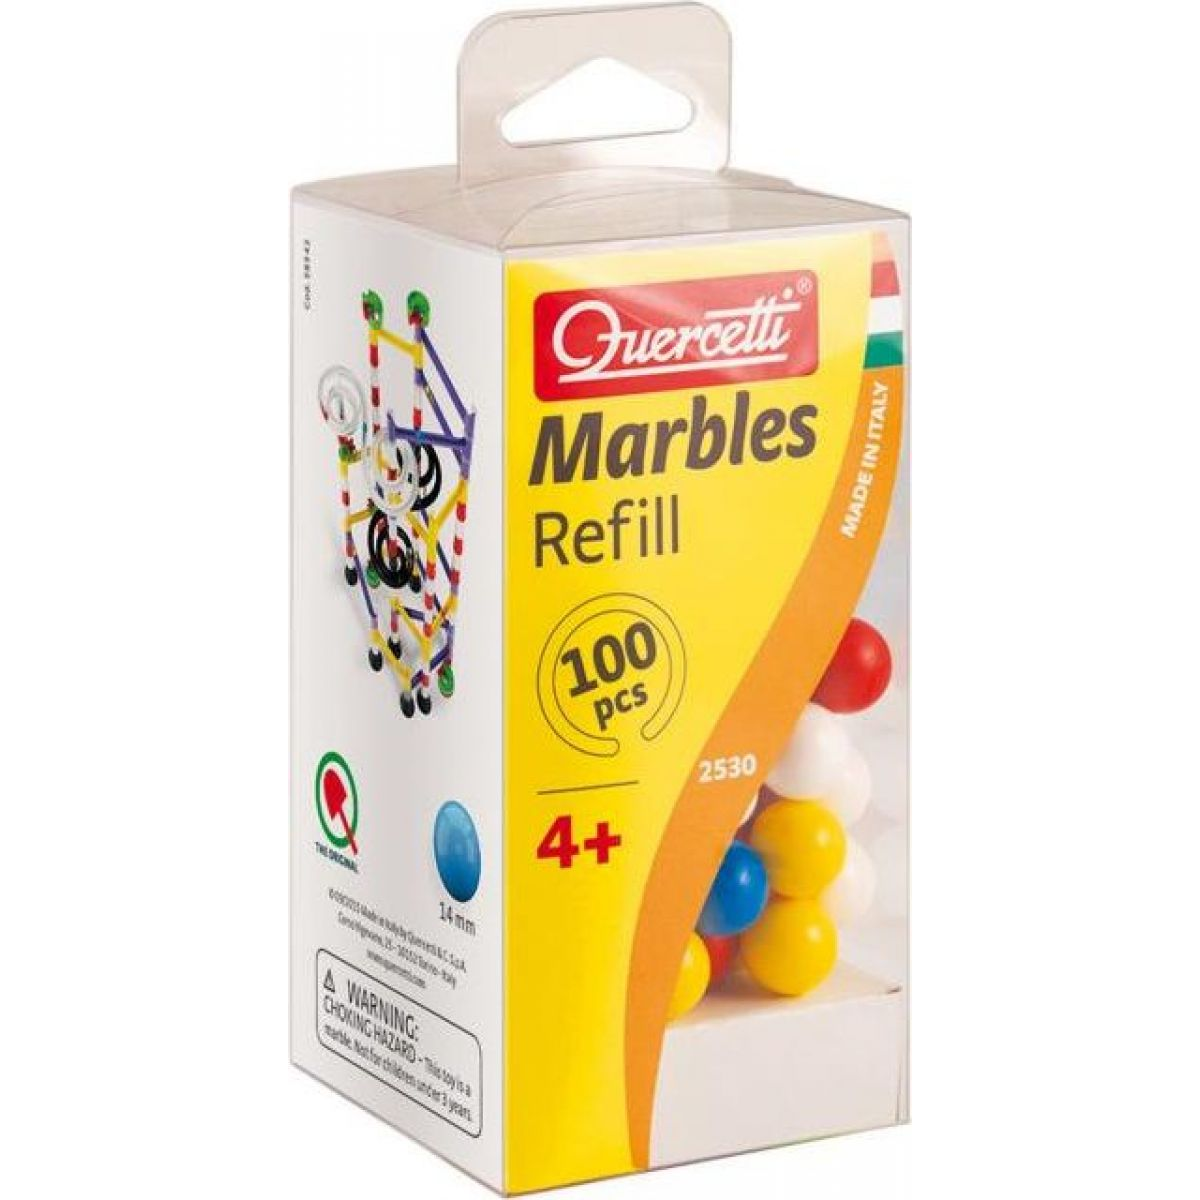 Quercetti Marbles Refill 100